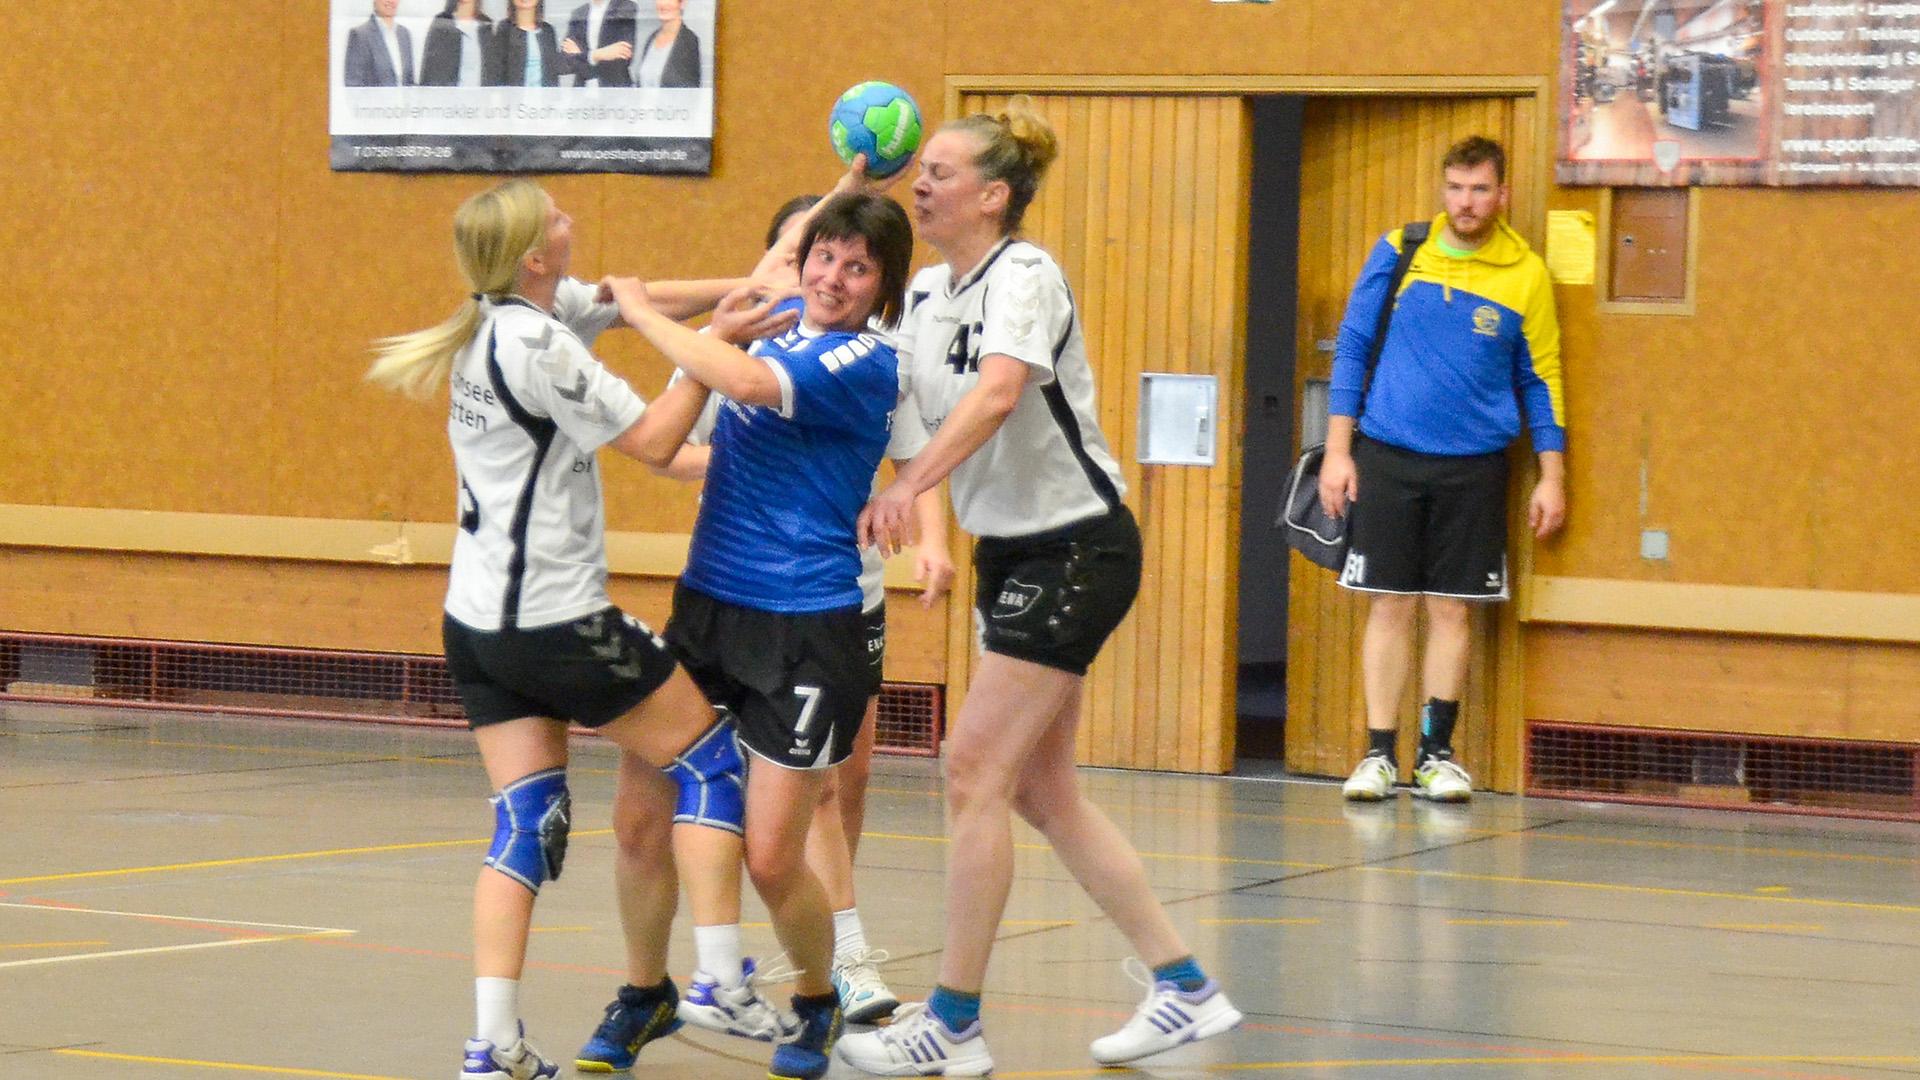 046Slider_F30_tsg_leutkirch_handball